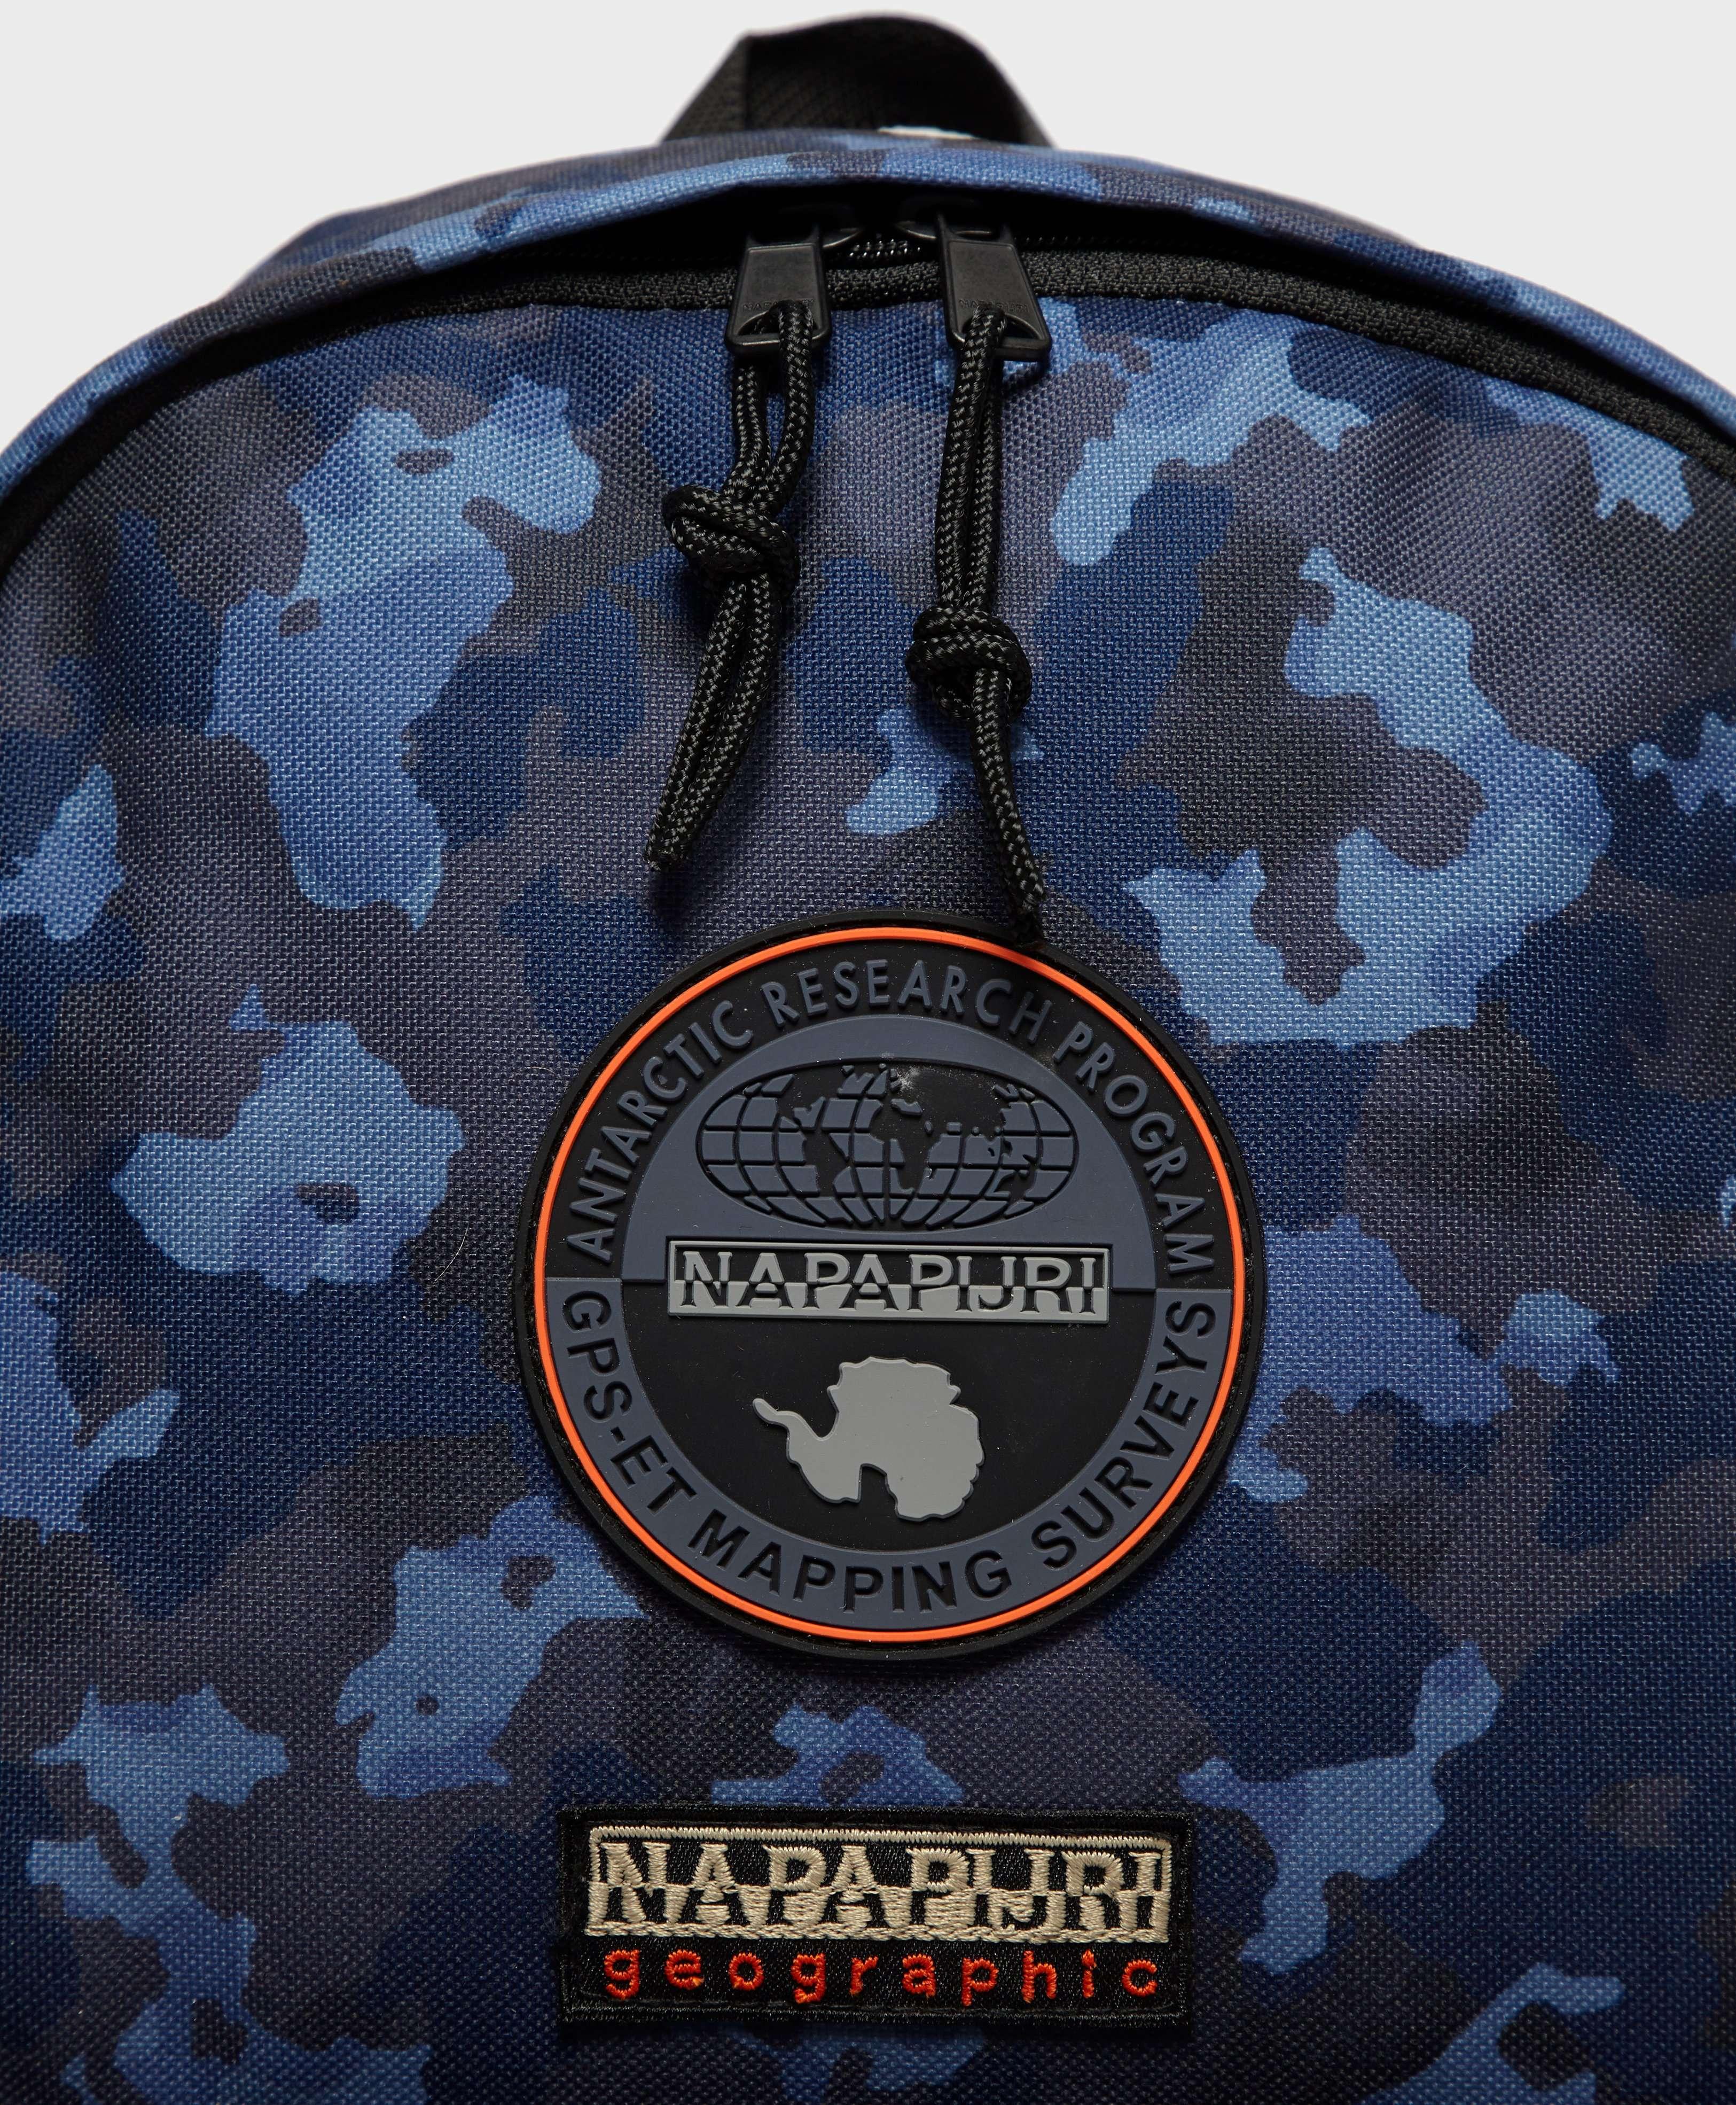 Napapijri Voyage Camo Backpack